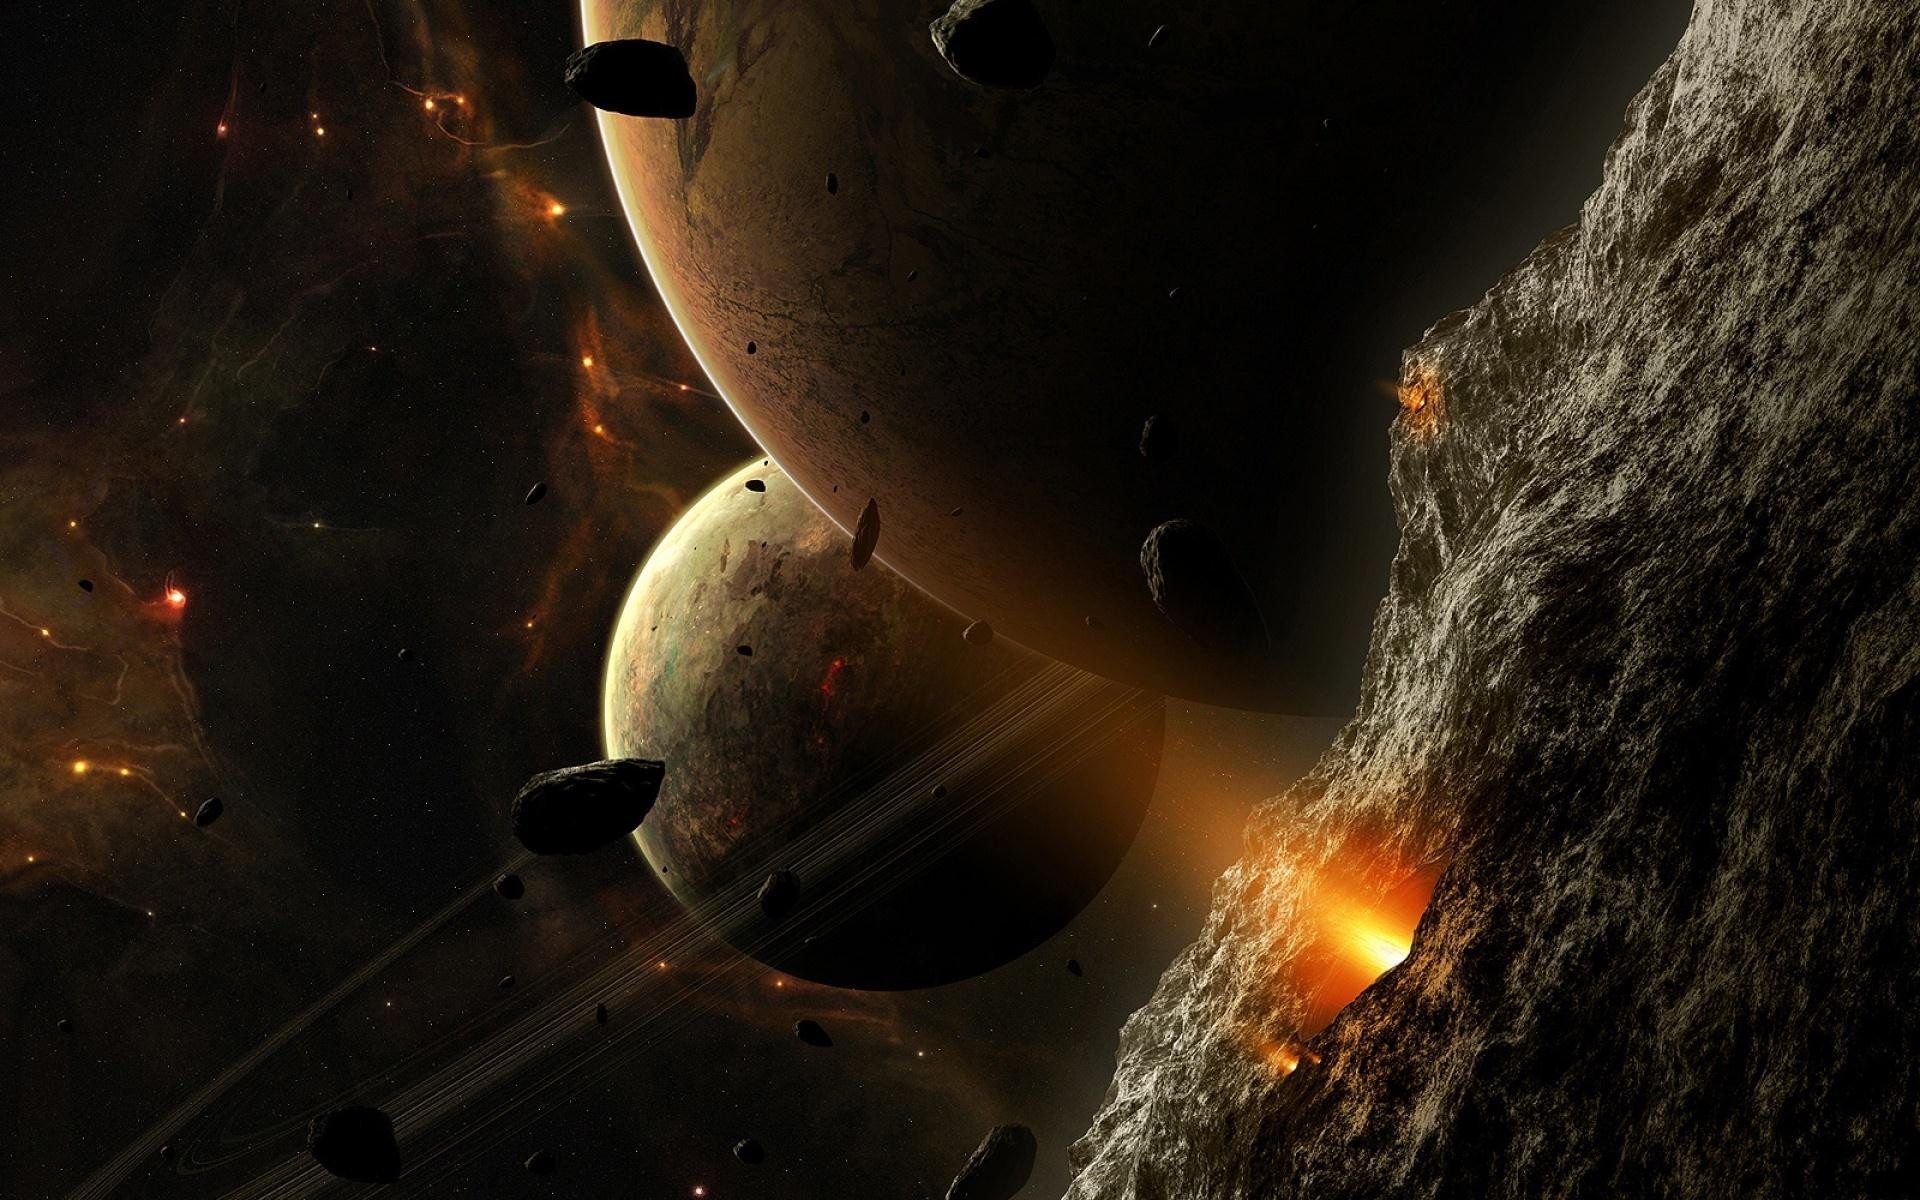 universe and planets digital art wallpapers Desktop Wallpaper